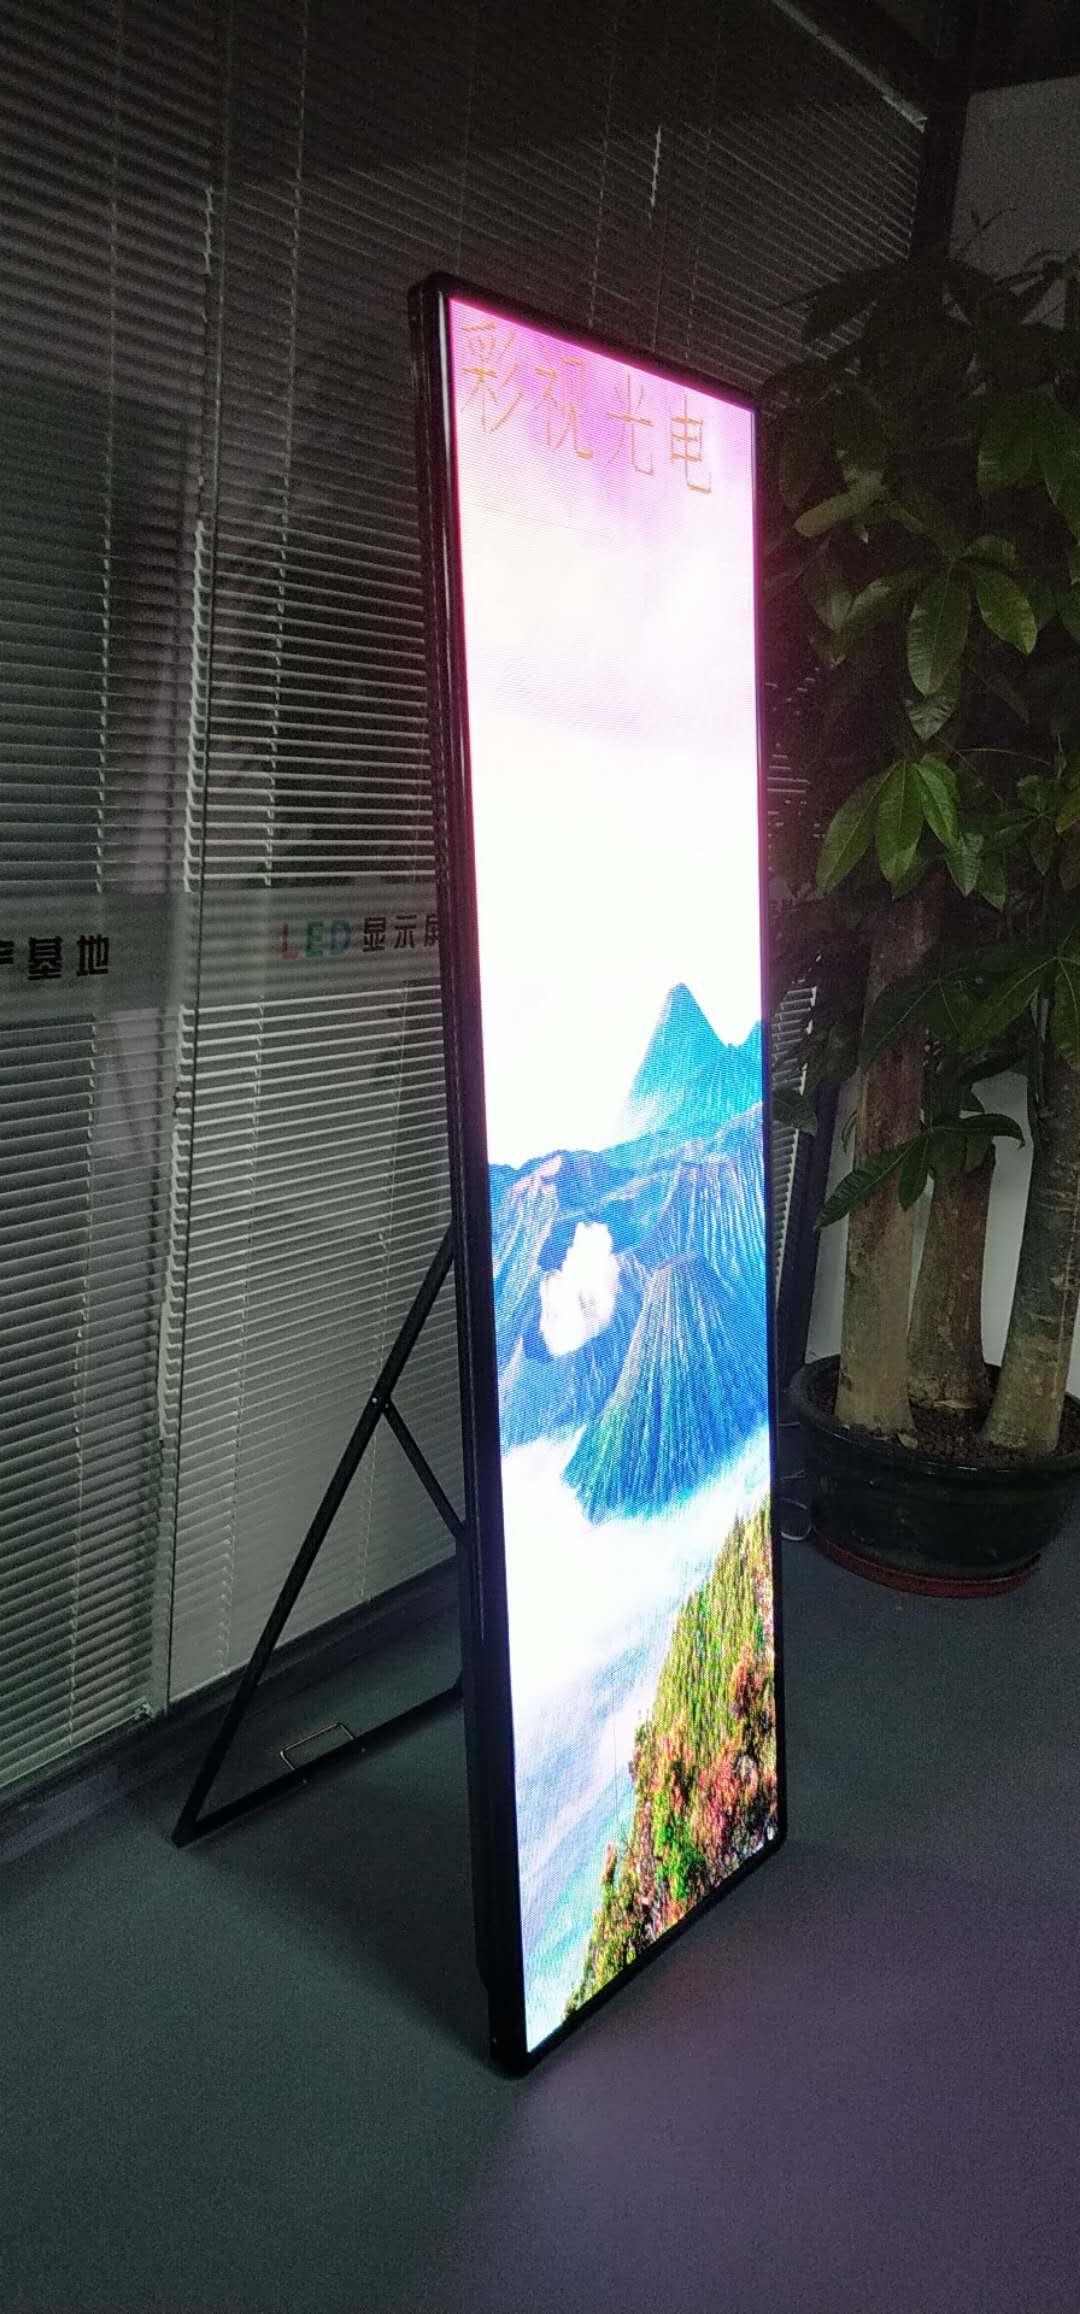 LED海报屏镜子屏